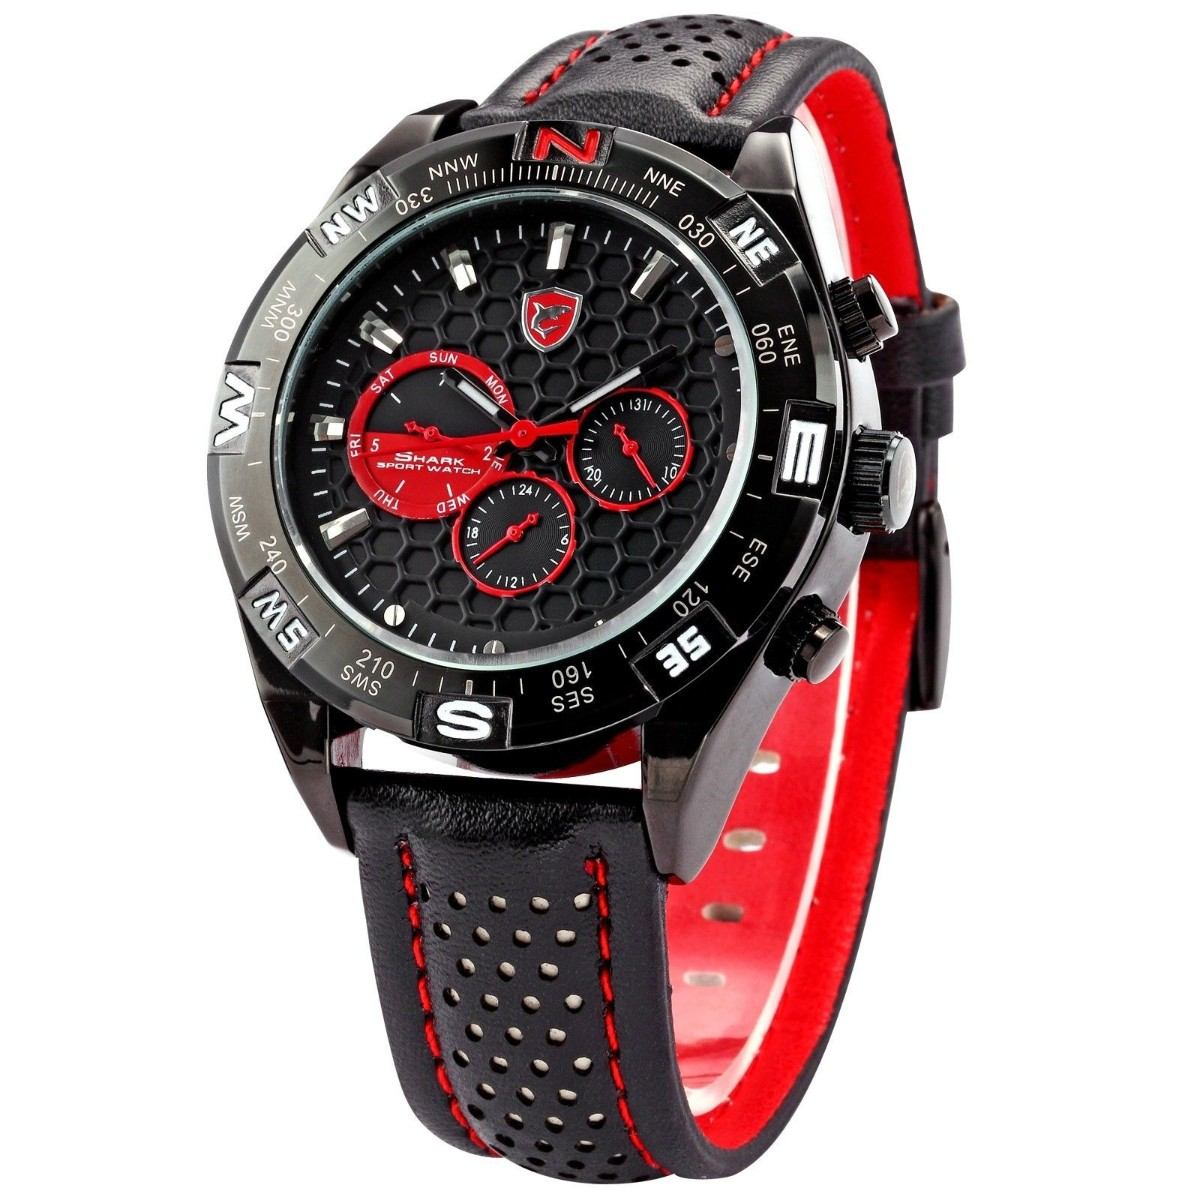 Reloj michael kors relojes pulsera otras marcas tattoo - Reloj de pared adhesivo ...